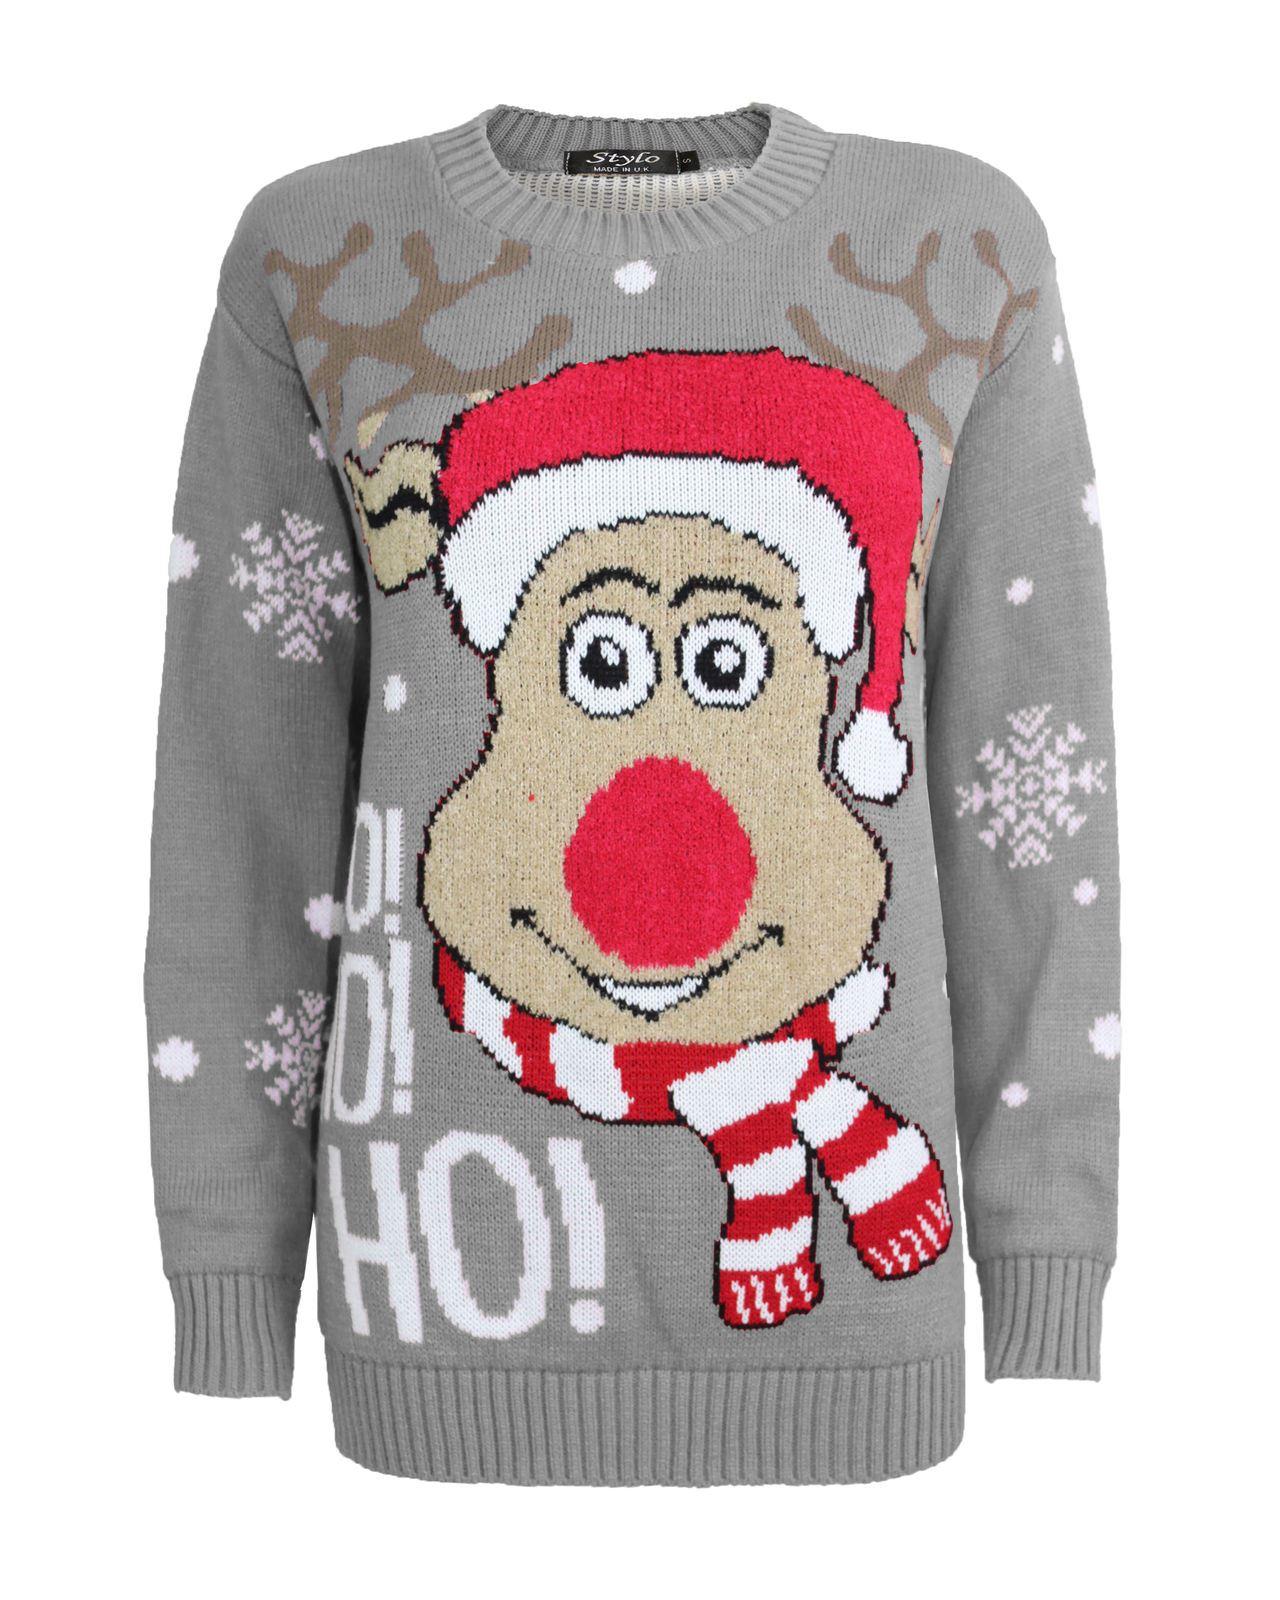 New Unisex Adult Kids Knitted HoHoHo Christmas Xmas Reindeer Jumper Top Sweat...